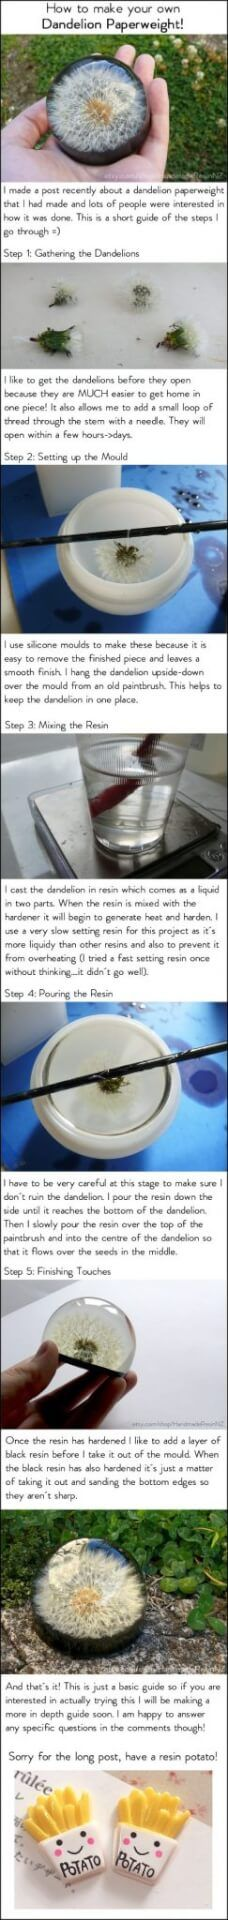 Dandelion paperweight tutorial